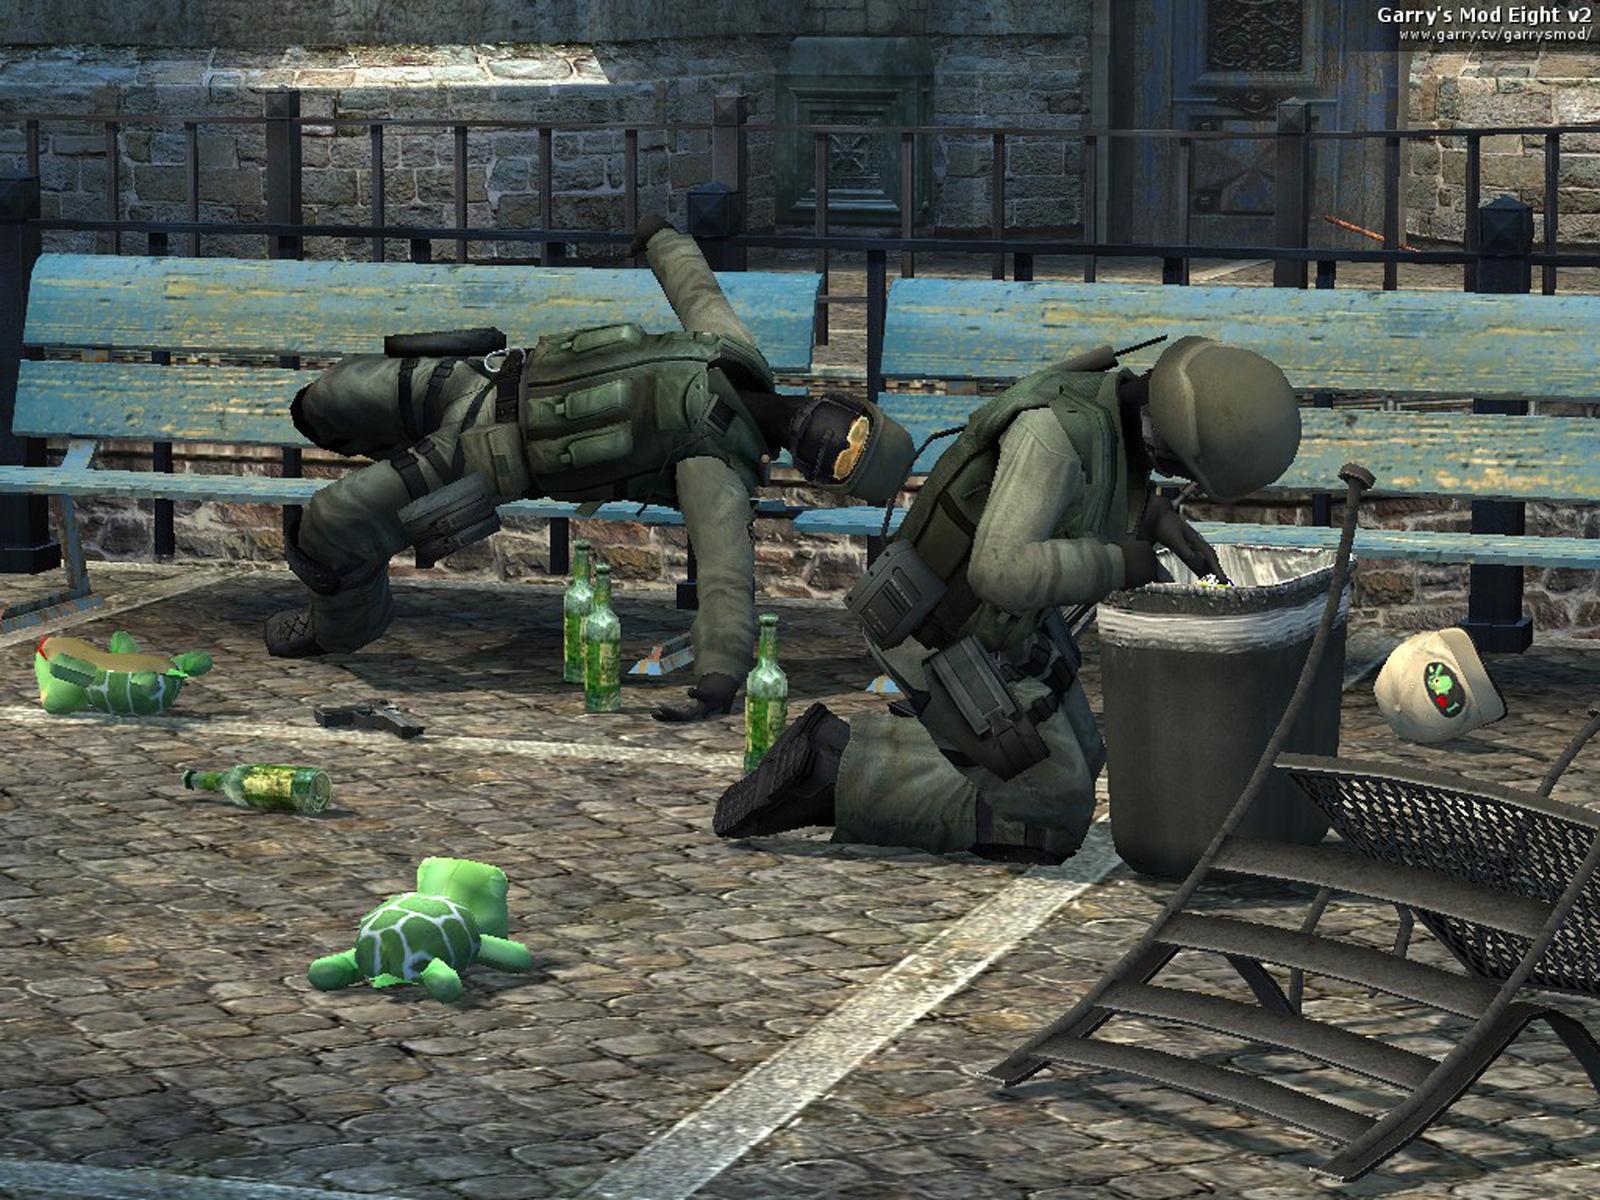 Küçük.  FB Paylaş.  Сборник приколов (скриншотов) на тему Counter Strike. .  İndir.